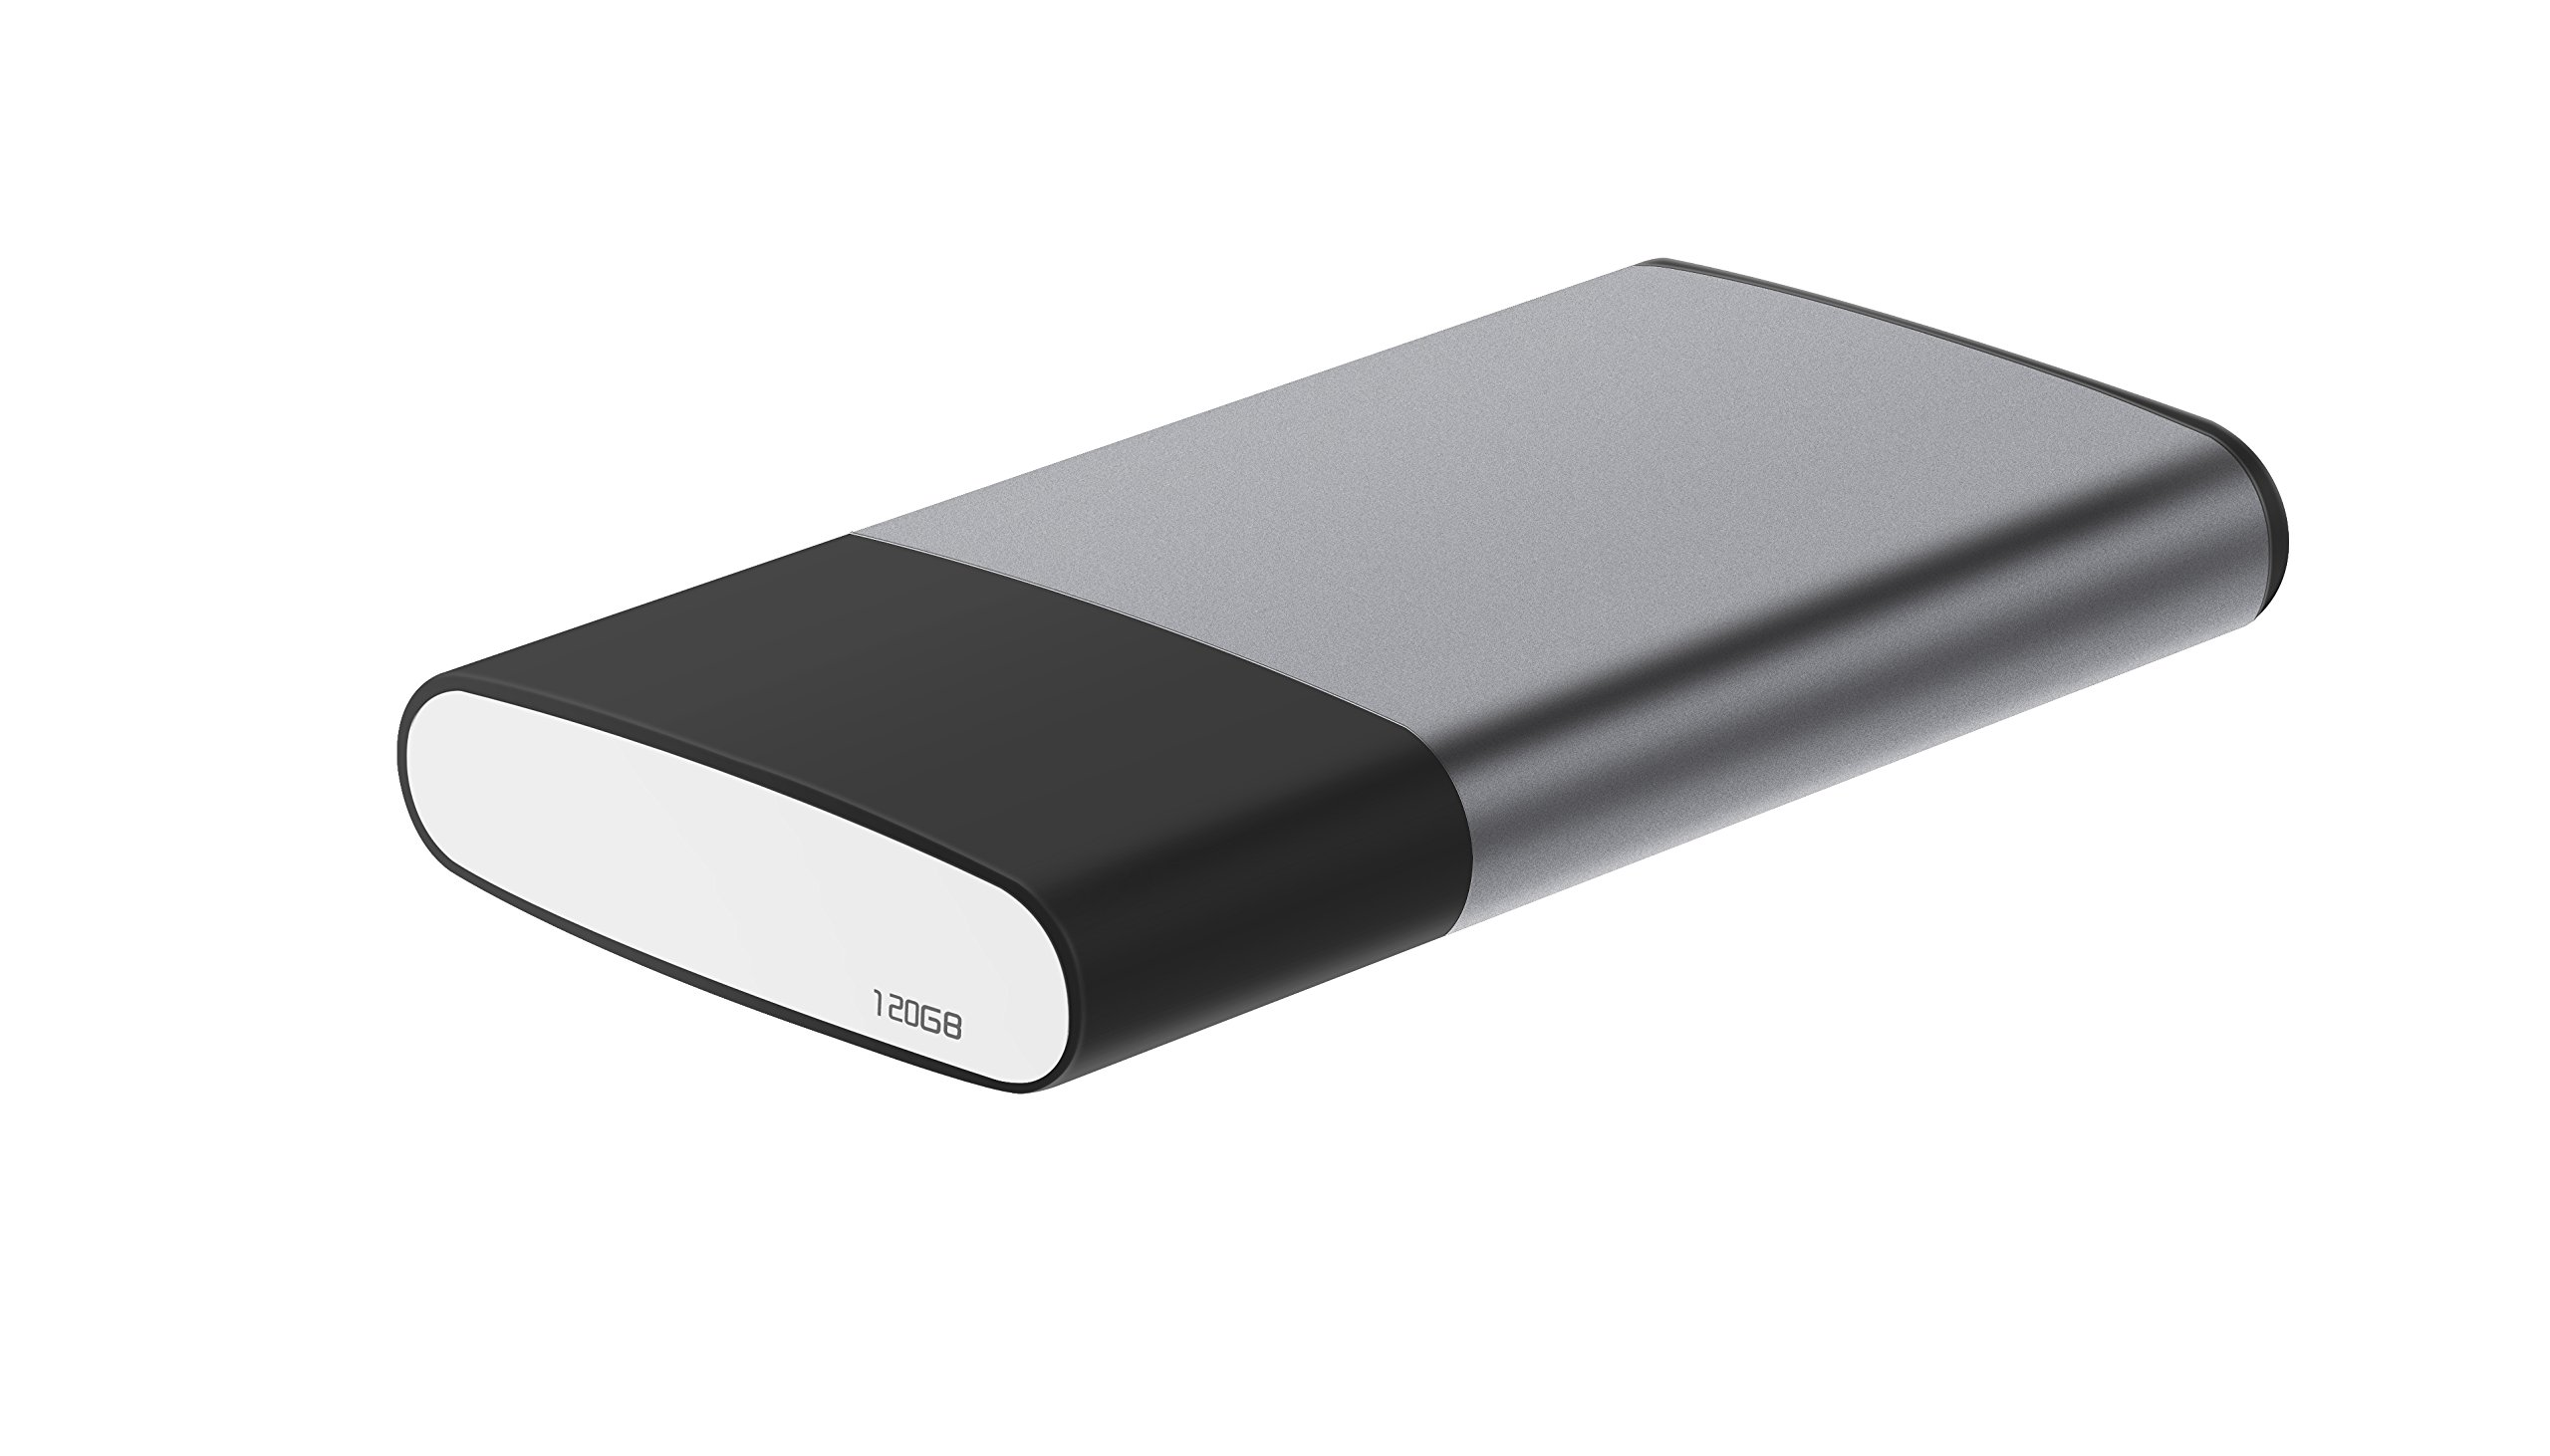 KingDian 120gb 240gb External SSD USB 3.0 Portable Solid State Drive (120GB) by KINGDIAN (Image #5)